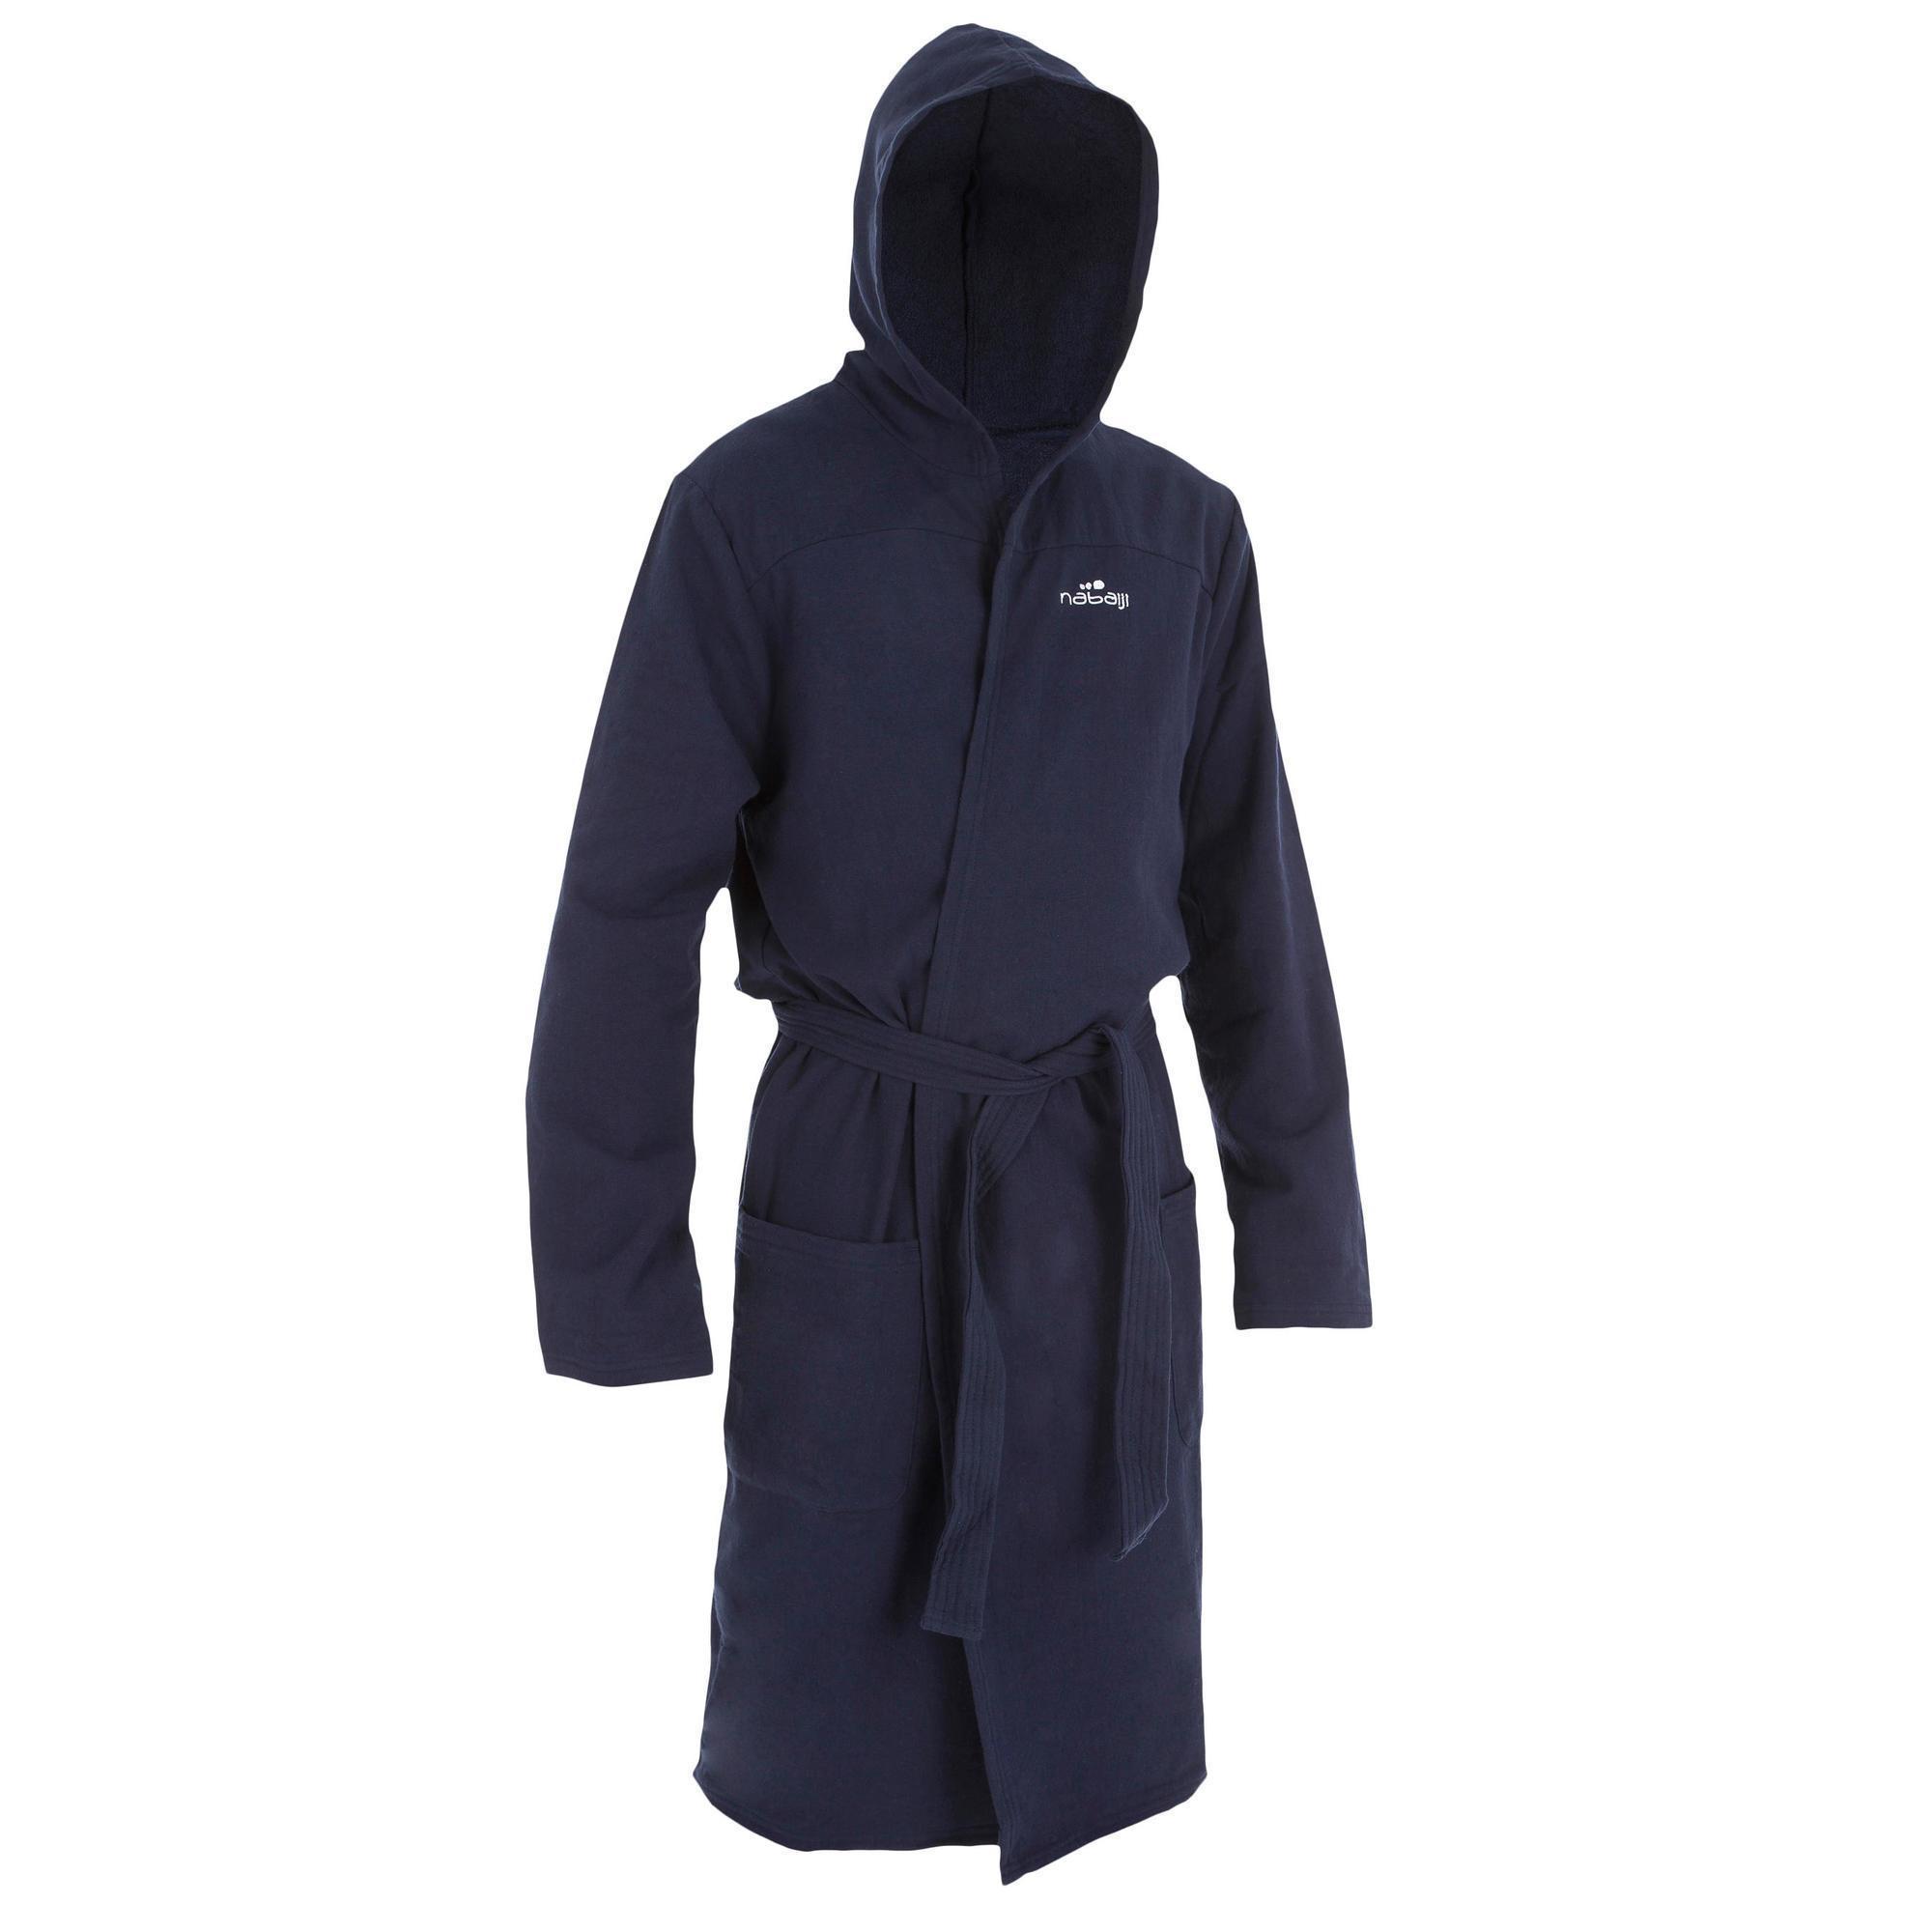 Peignoir coton l ger natation homme bleu fonc avec for Decathlon costumi piscina bambina